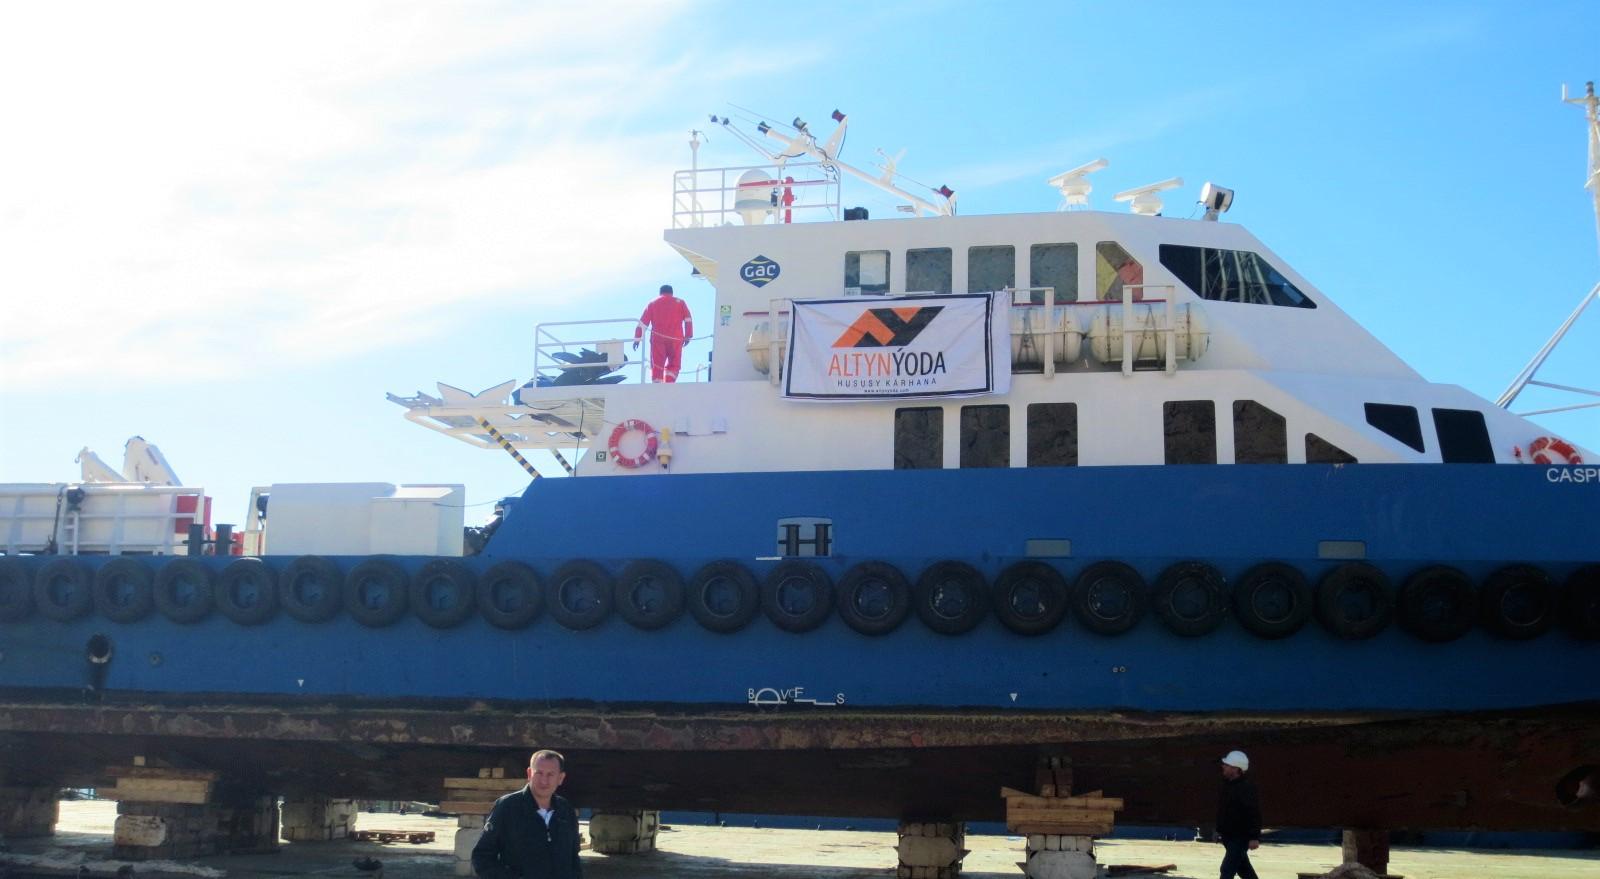 GAC Marine